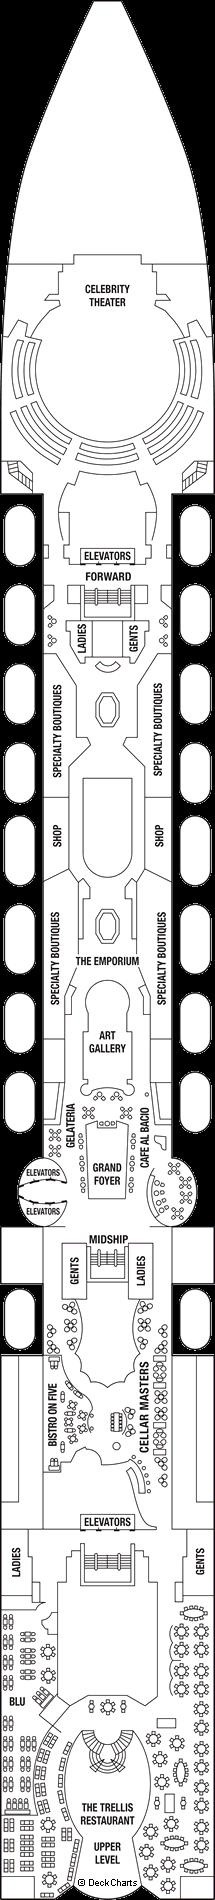 Celebrity Infinity: Deck 5